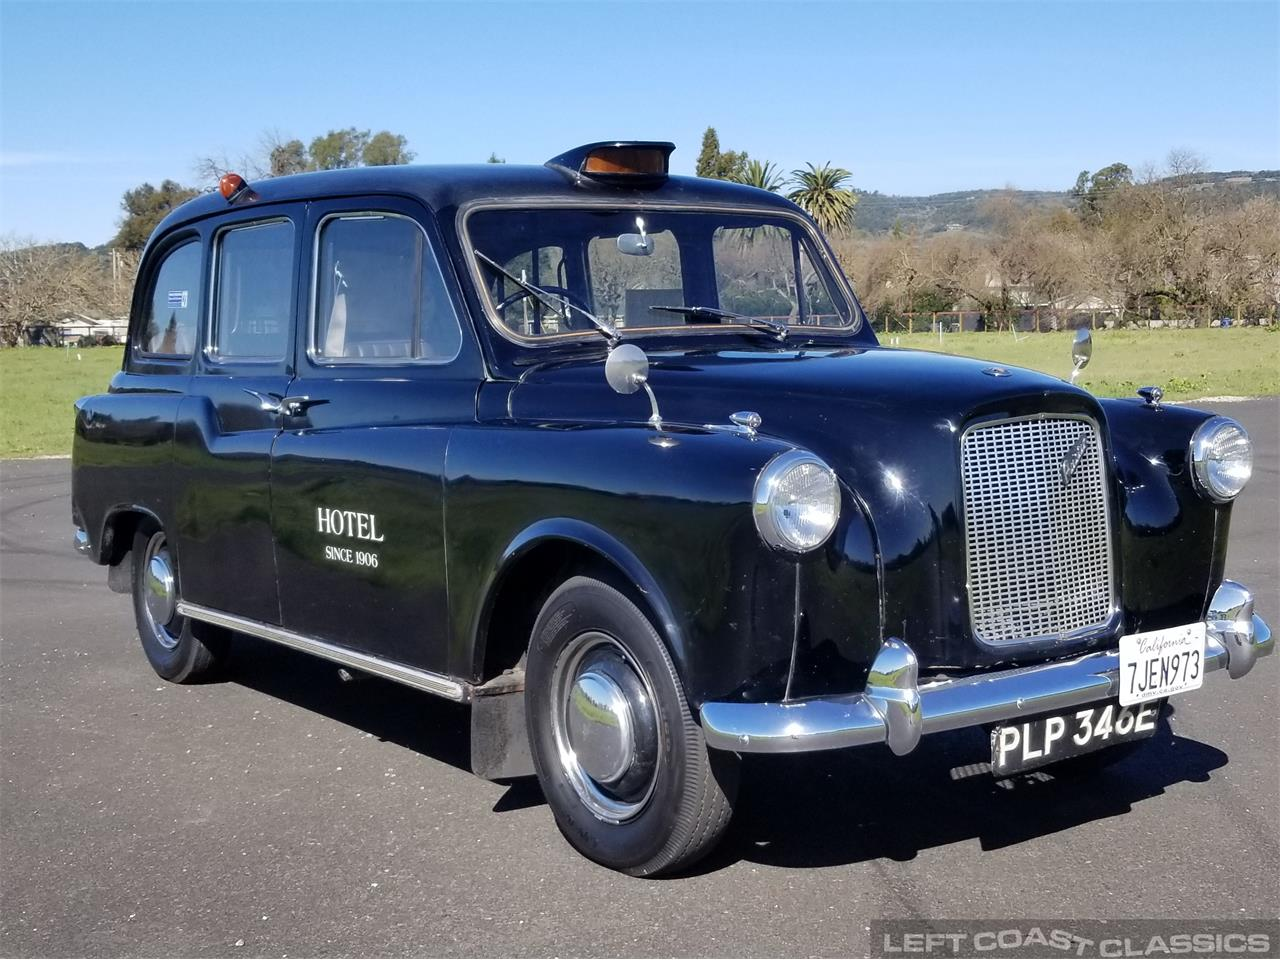 Large Picture of Classic '67 Austin FX4 Taxi Cab located in SONOMA California - PKBX